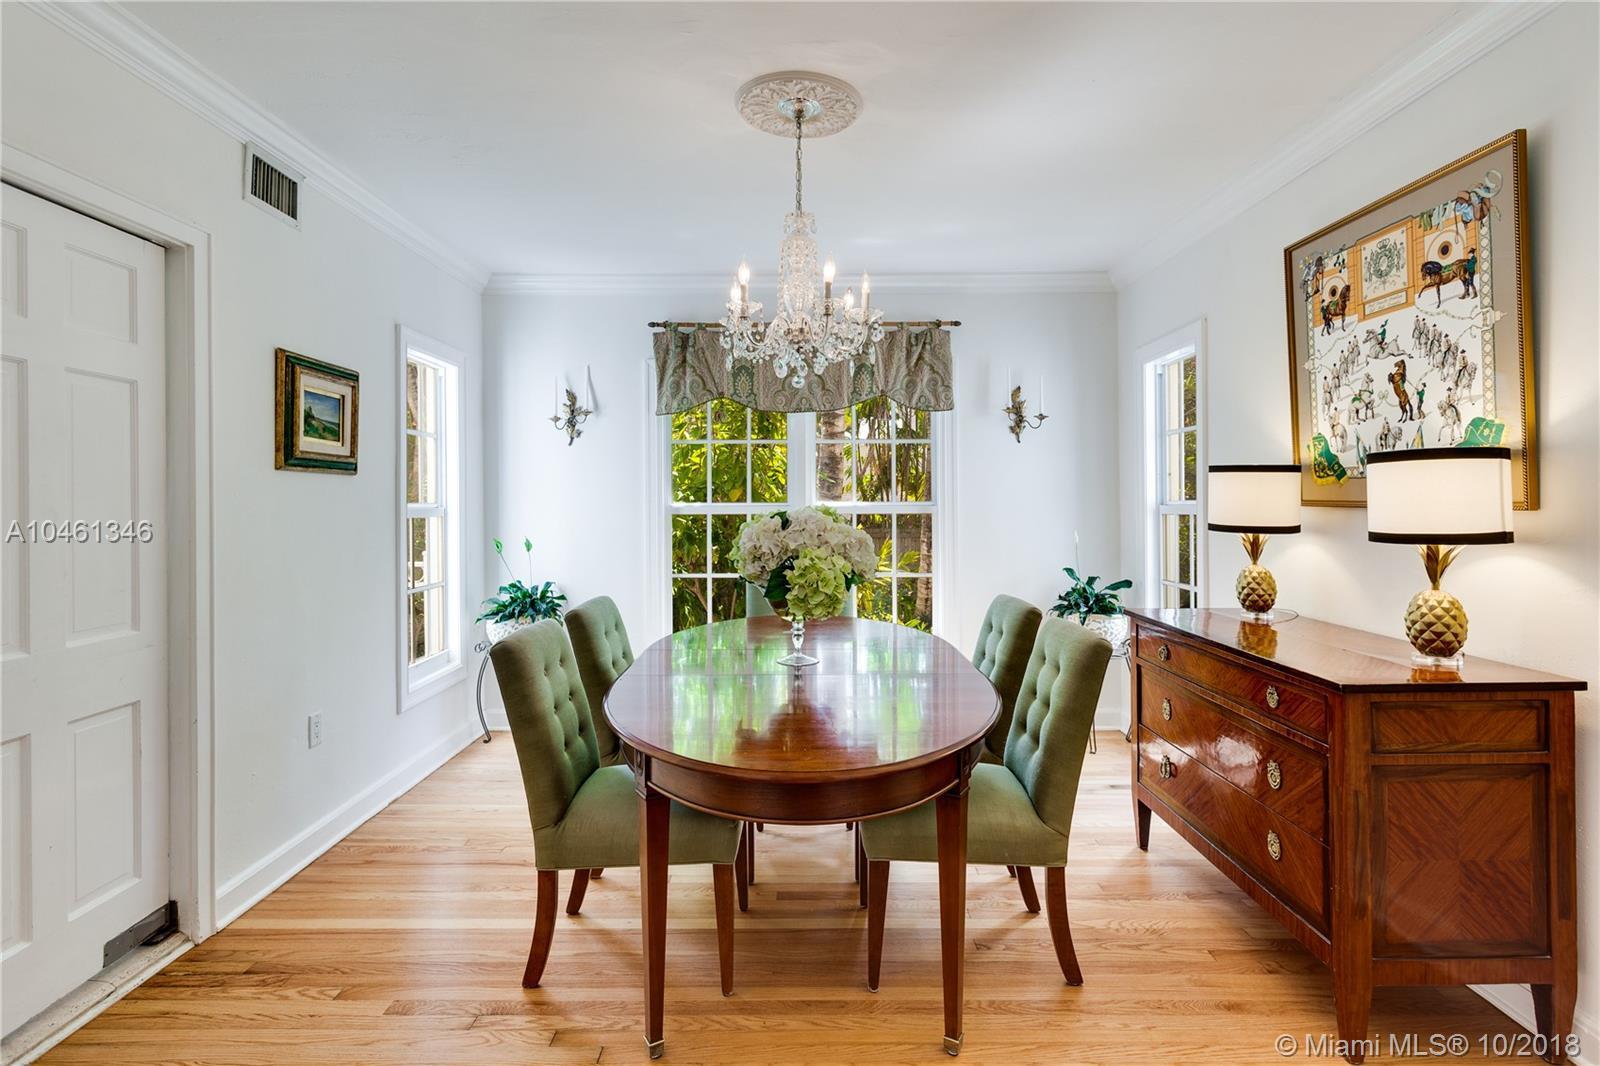 Carole Smith - Real Estate Agent in Coral Gables, FL ...